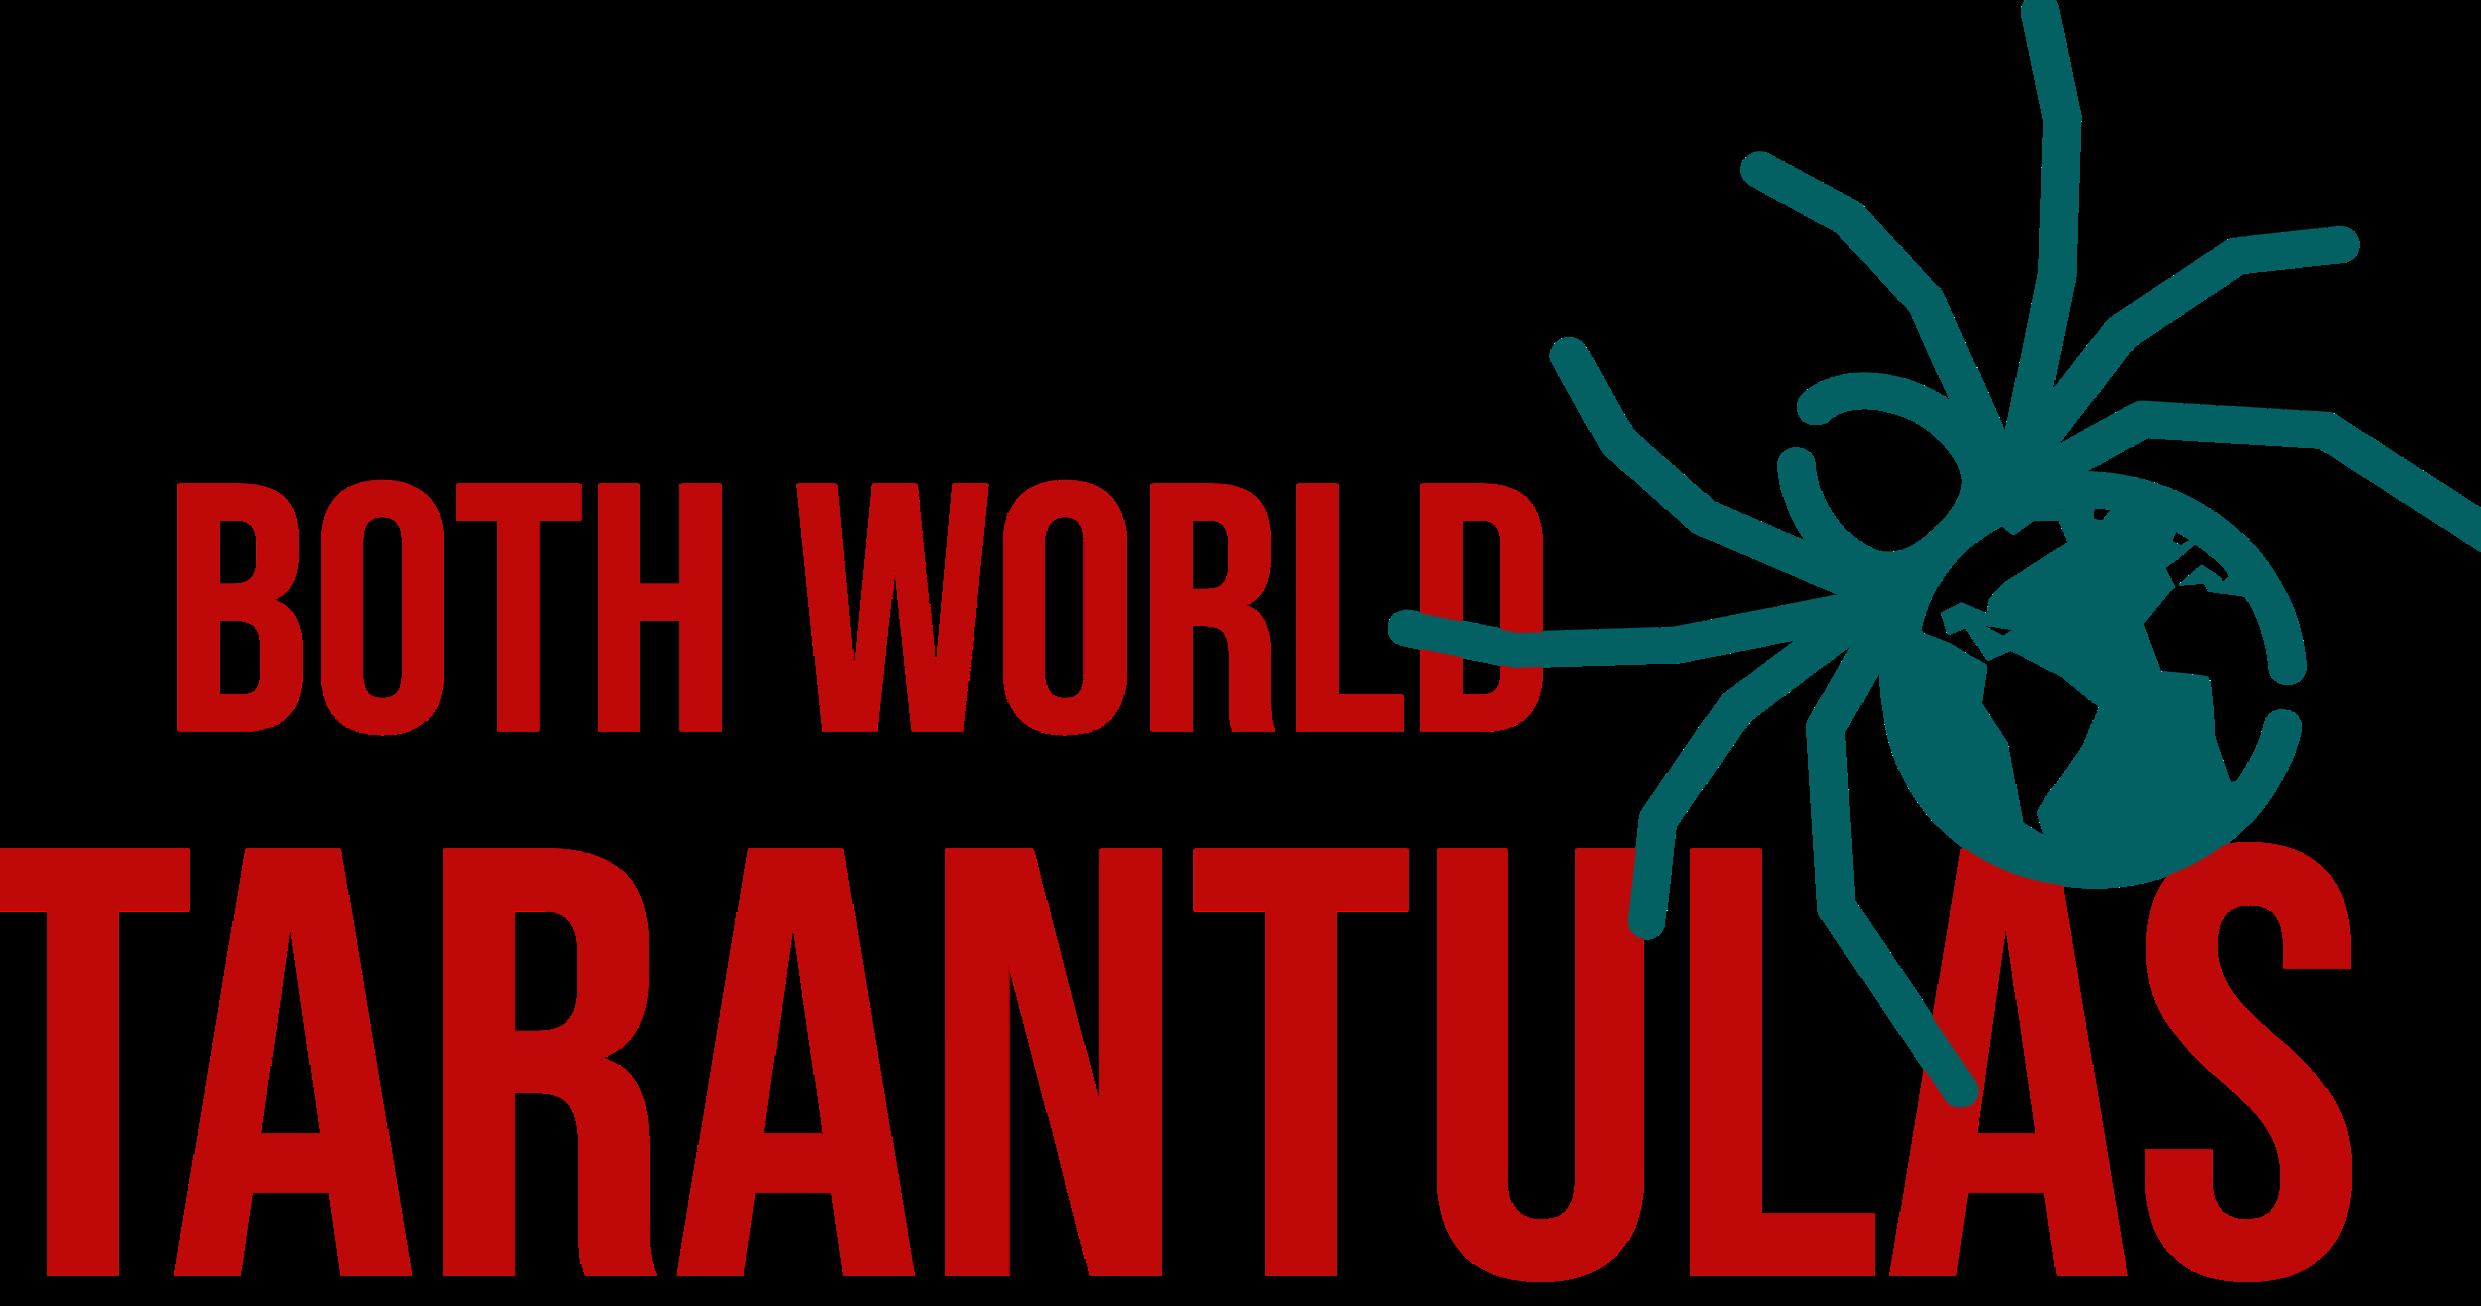 Logo for Both World Tarantulas